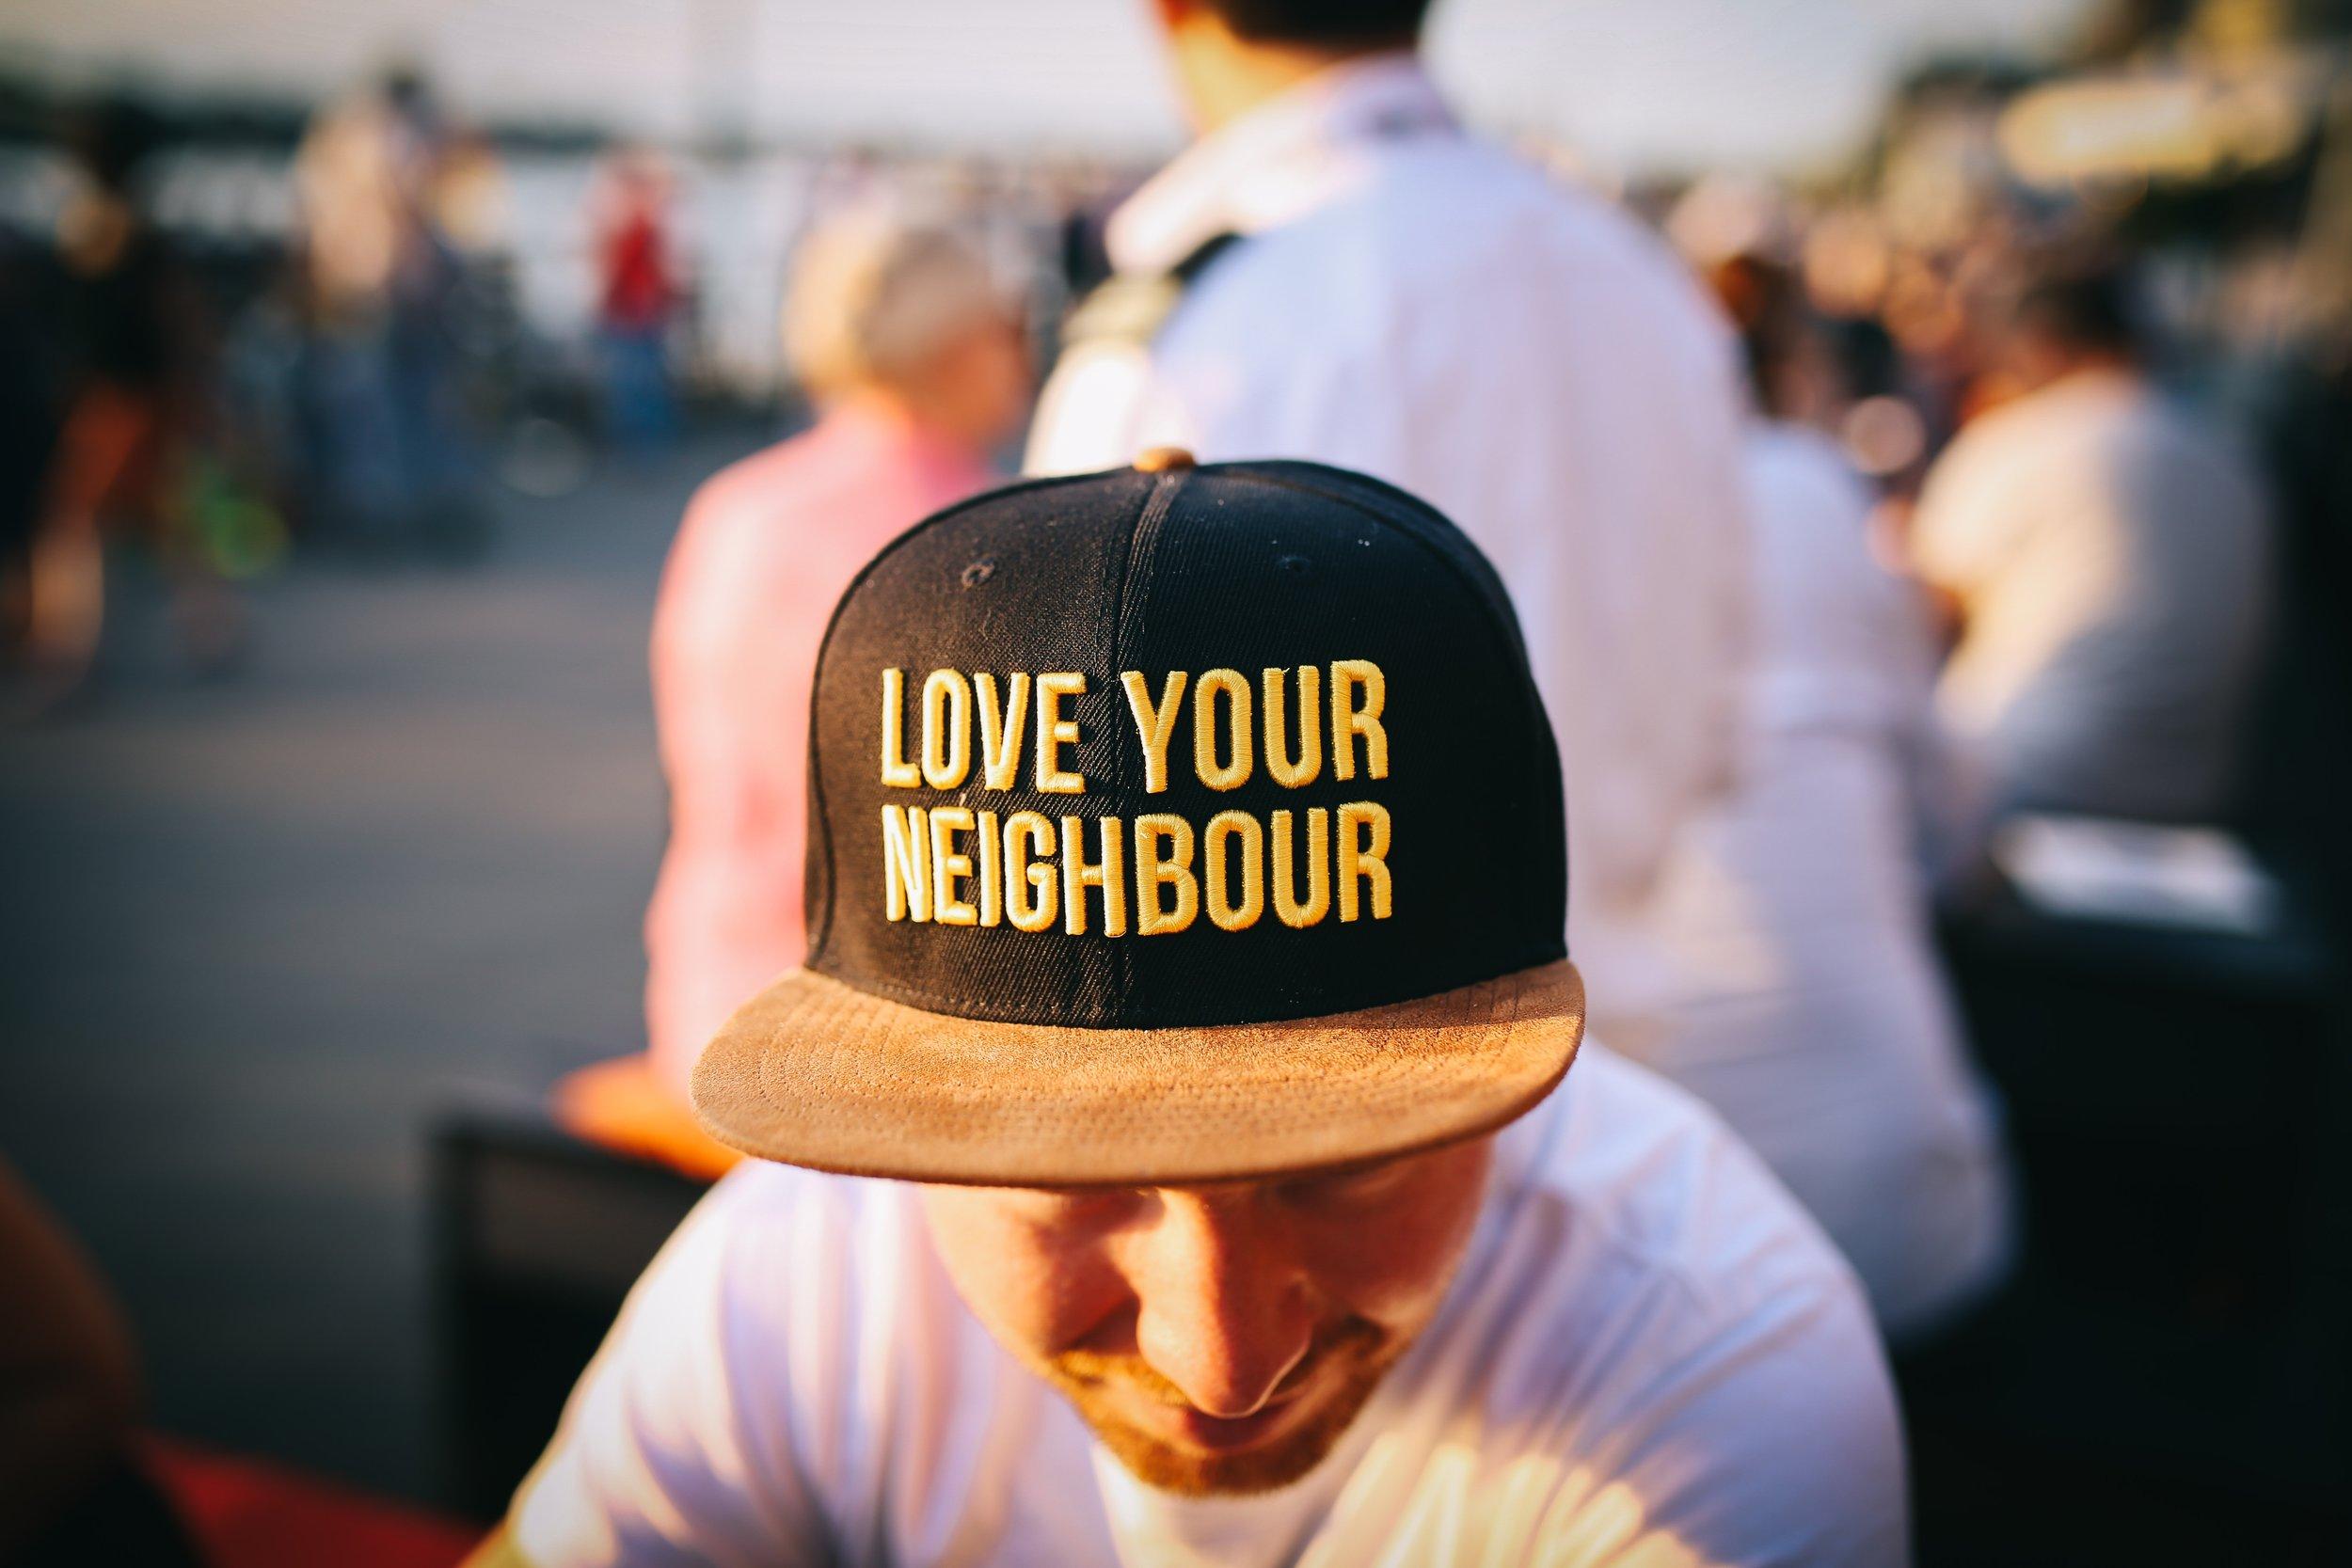 Intent on Community Impact -